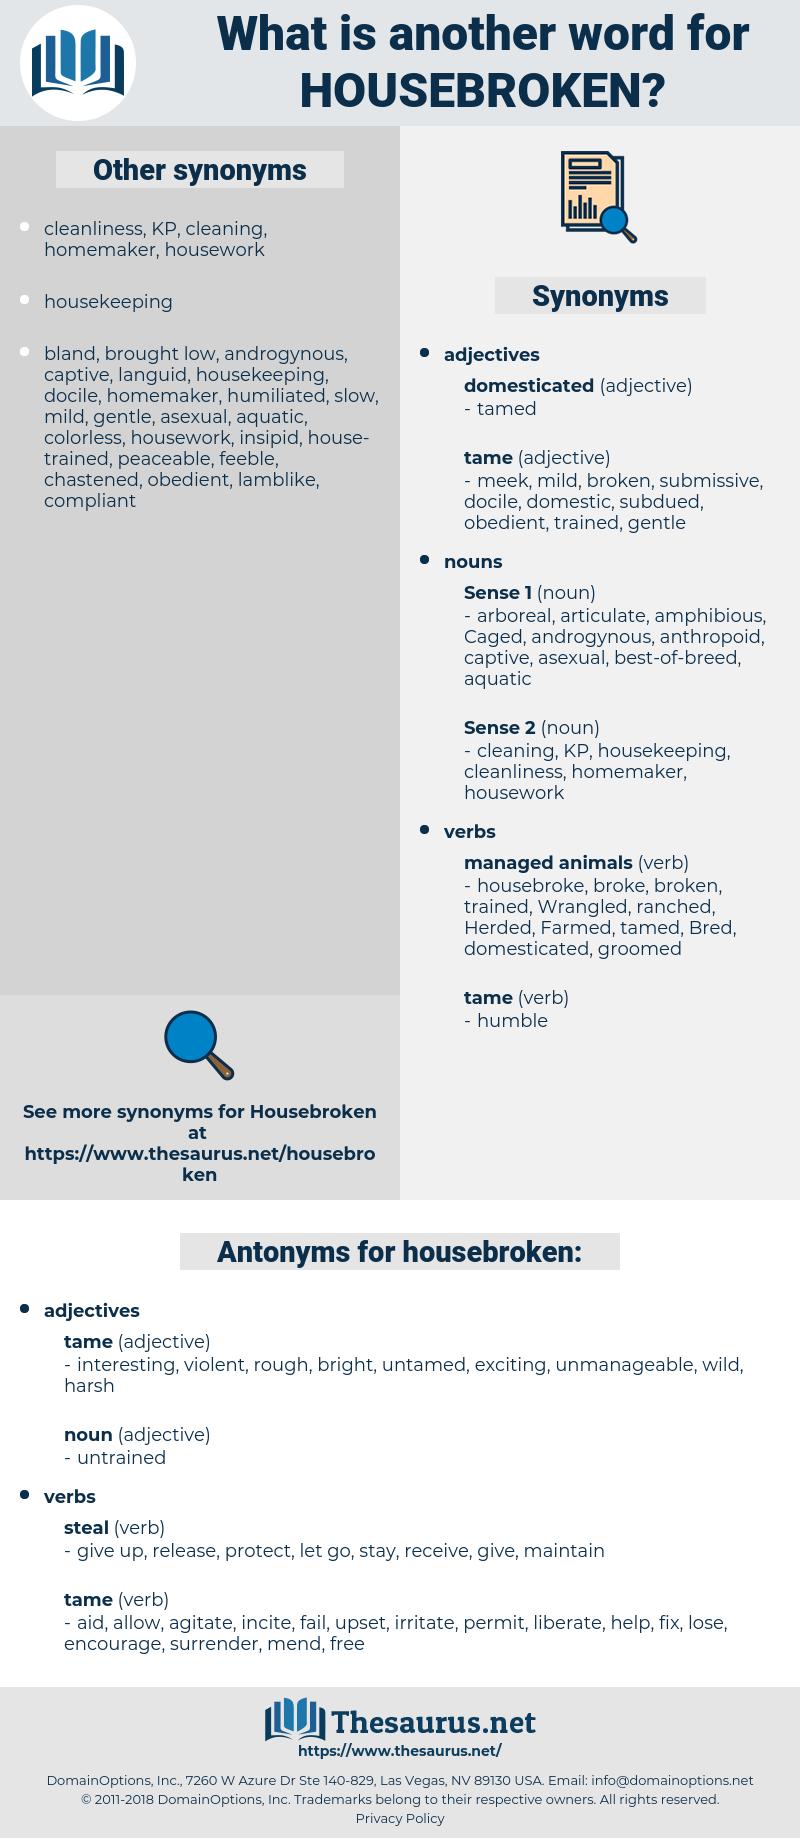 housebroken, synonym housebroken, another word for housebroken, words like housebroken, thesaurus housebroken